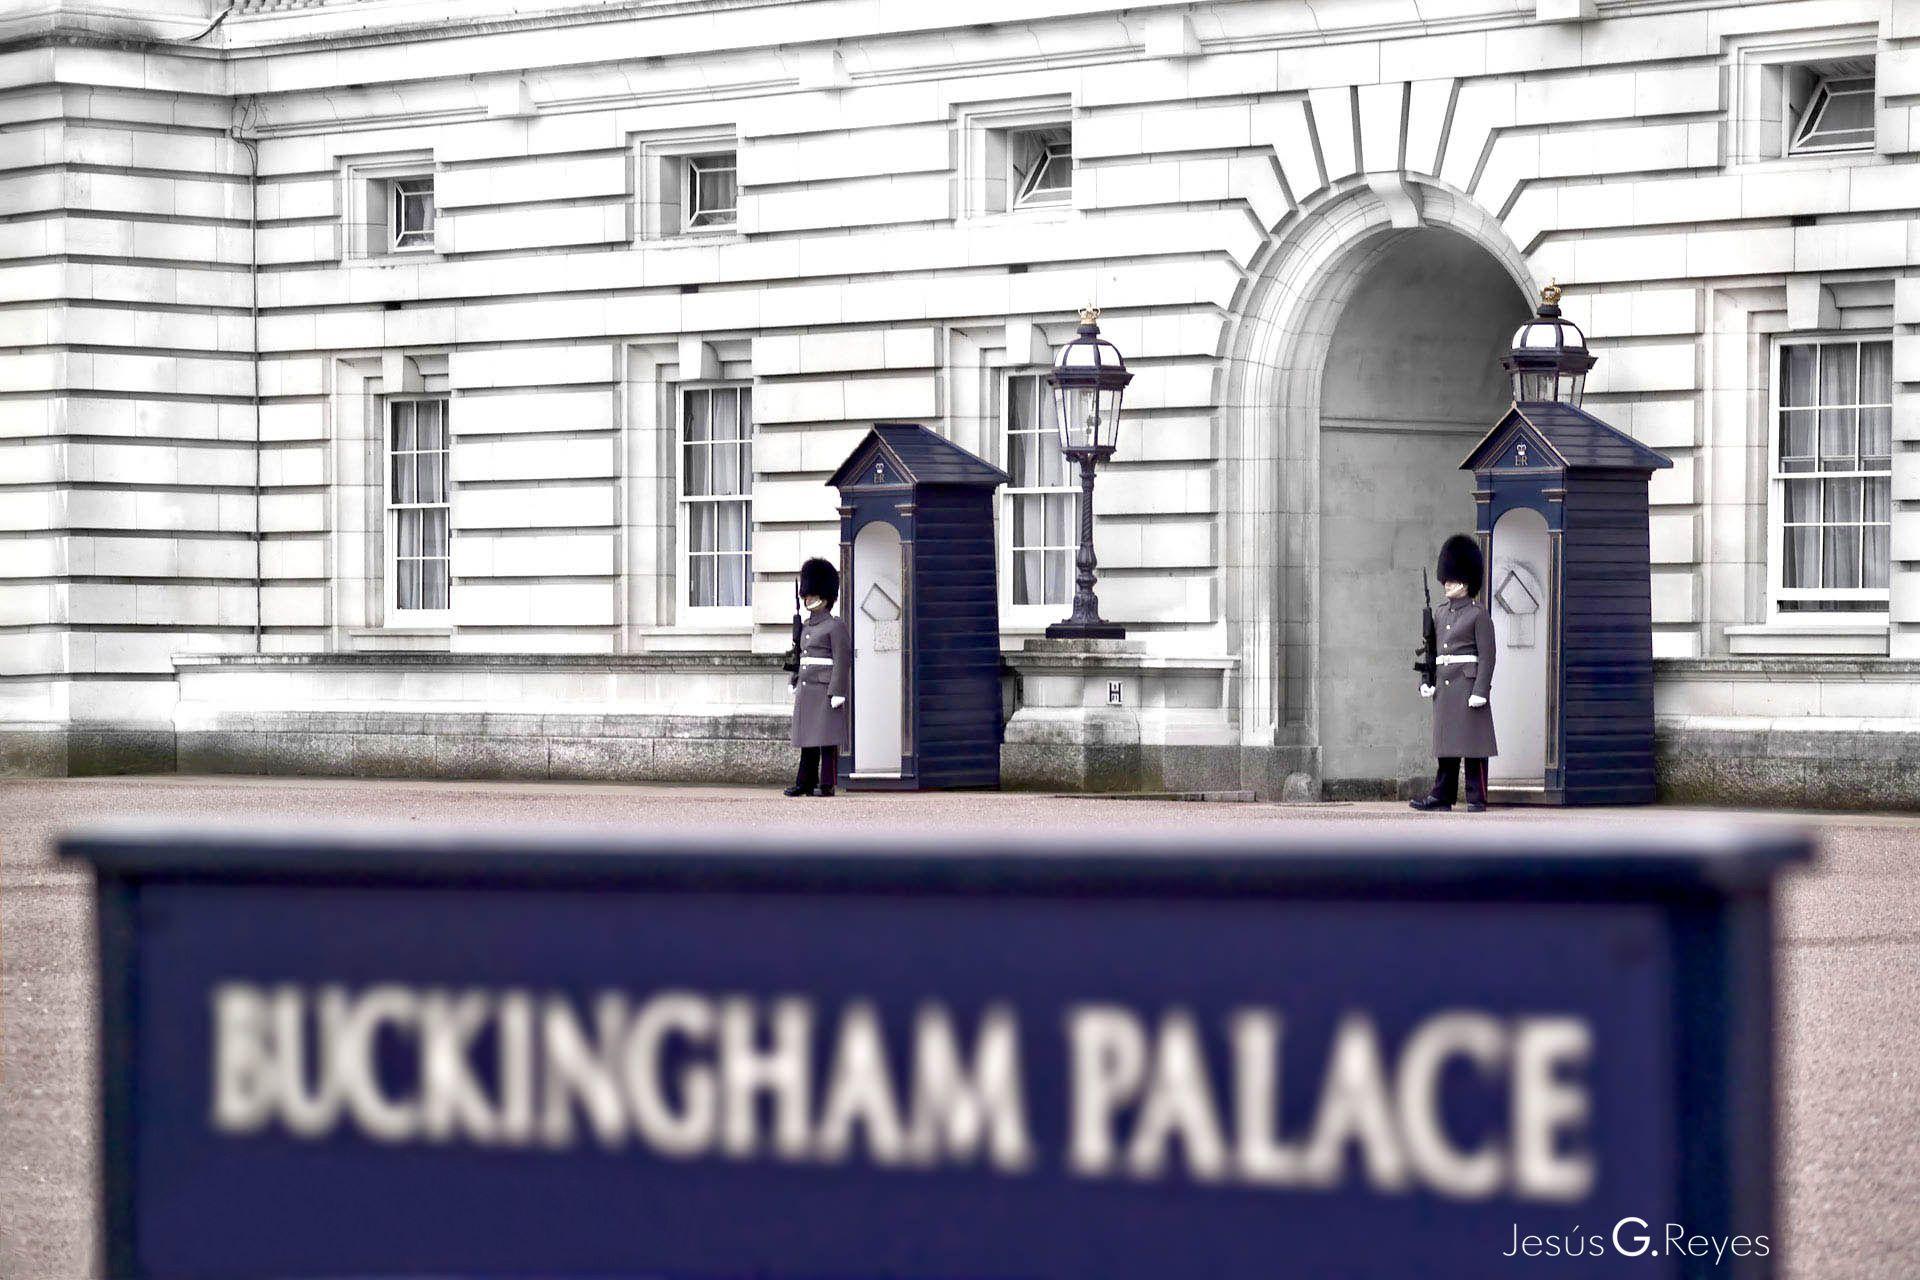 Buckingham Palace. London